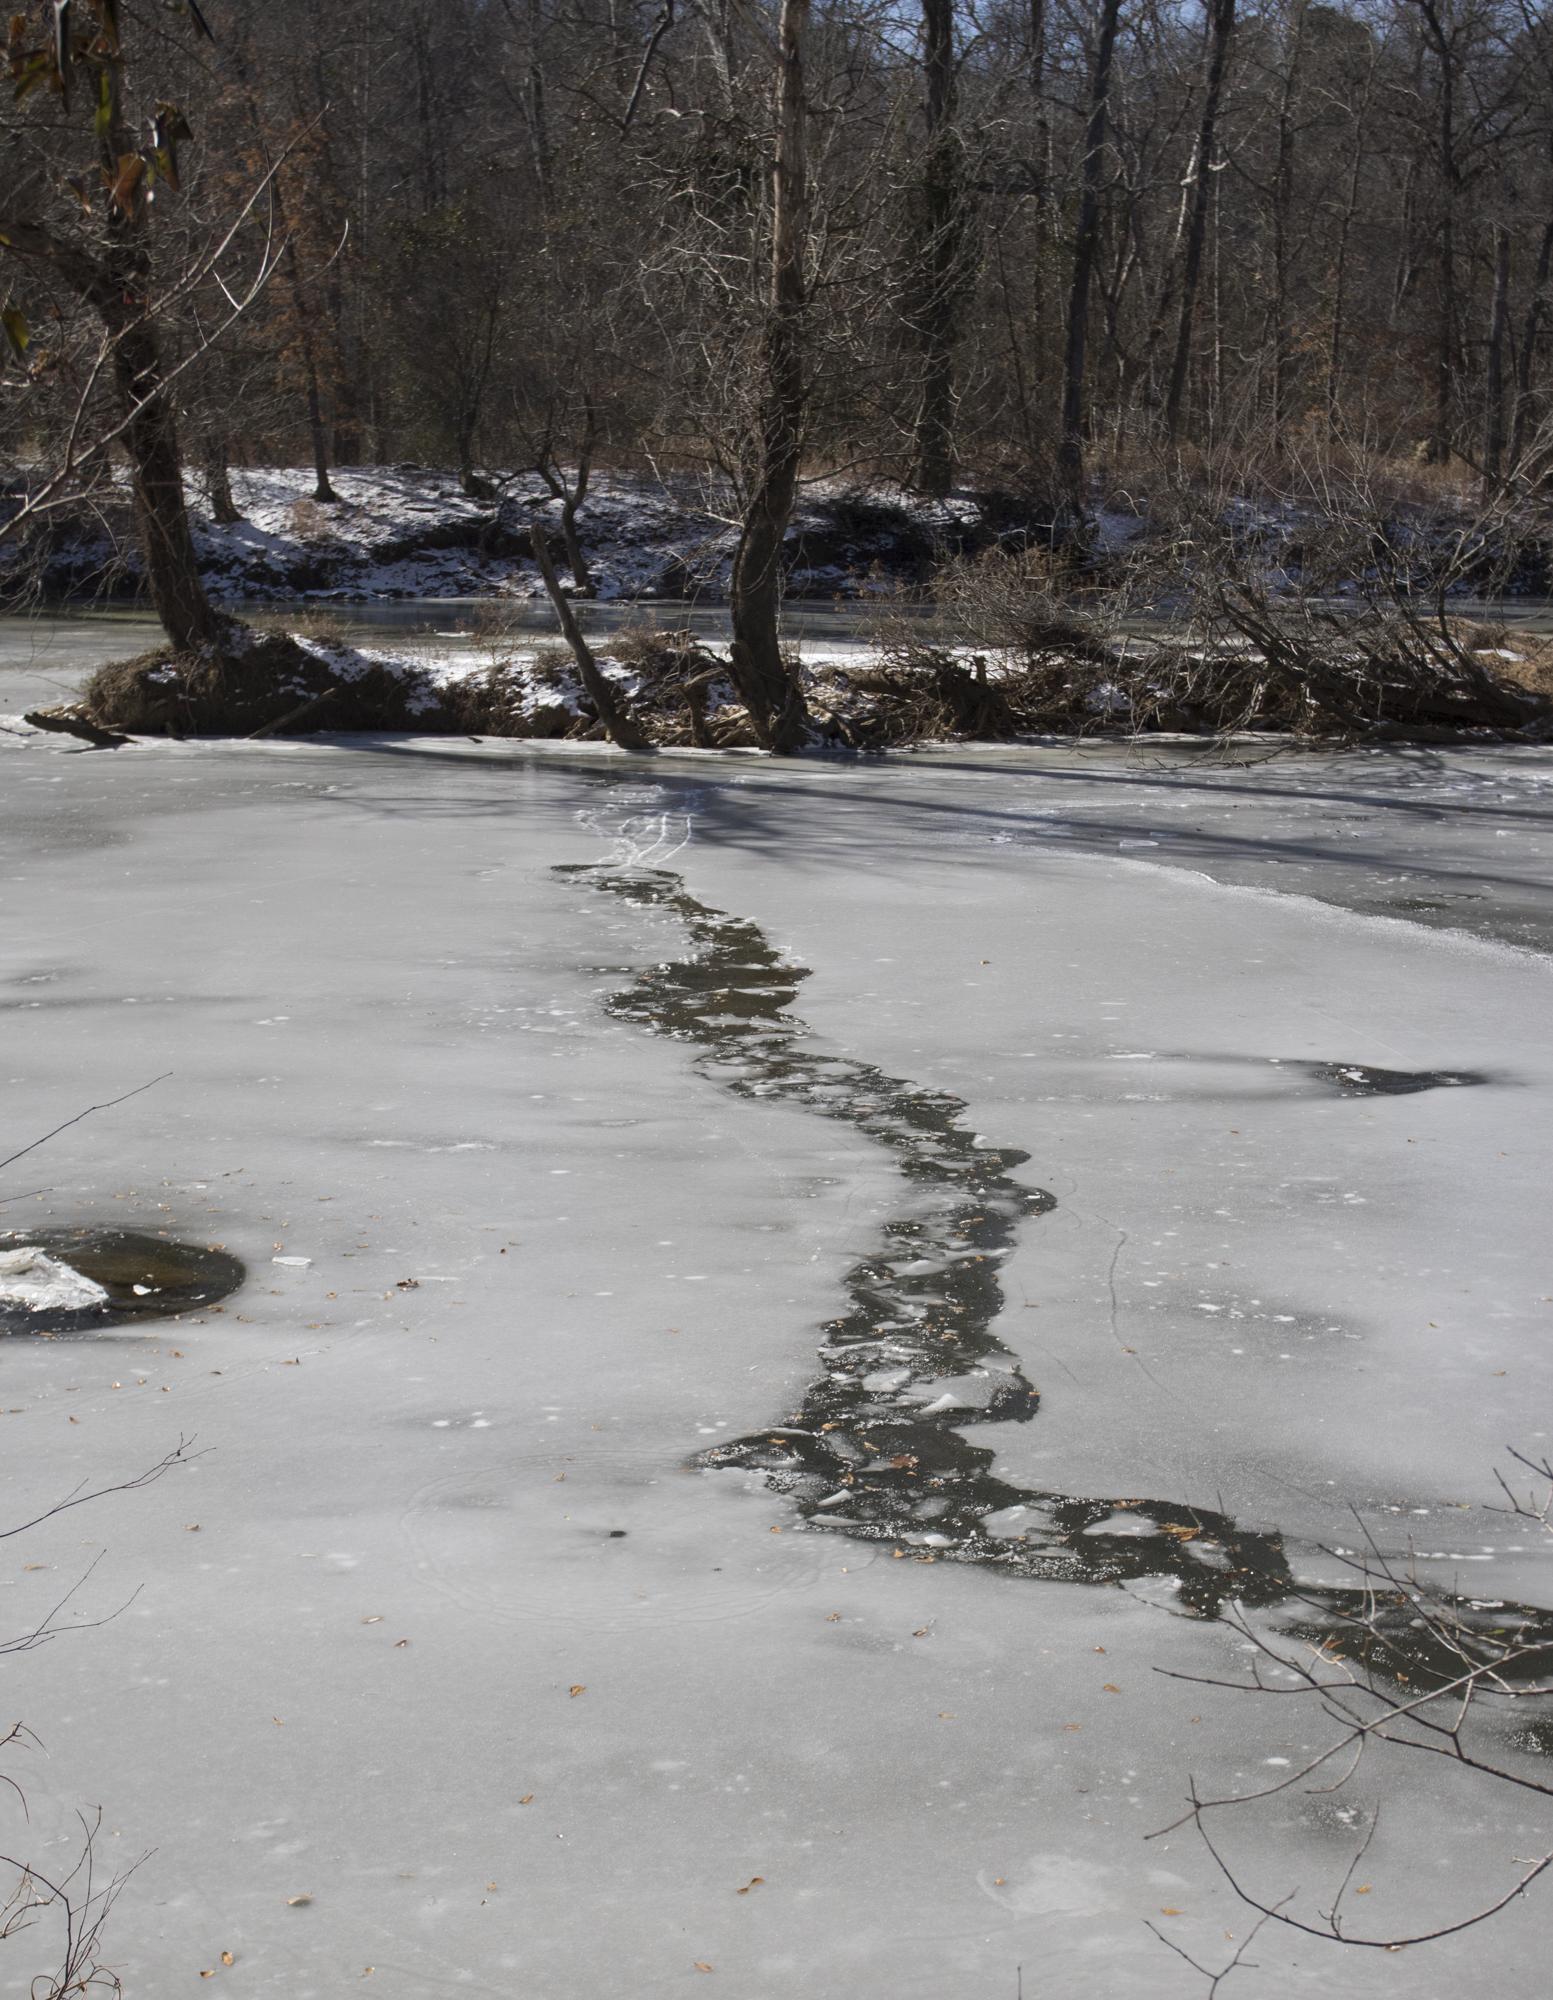 Beaver trail through ice